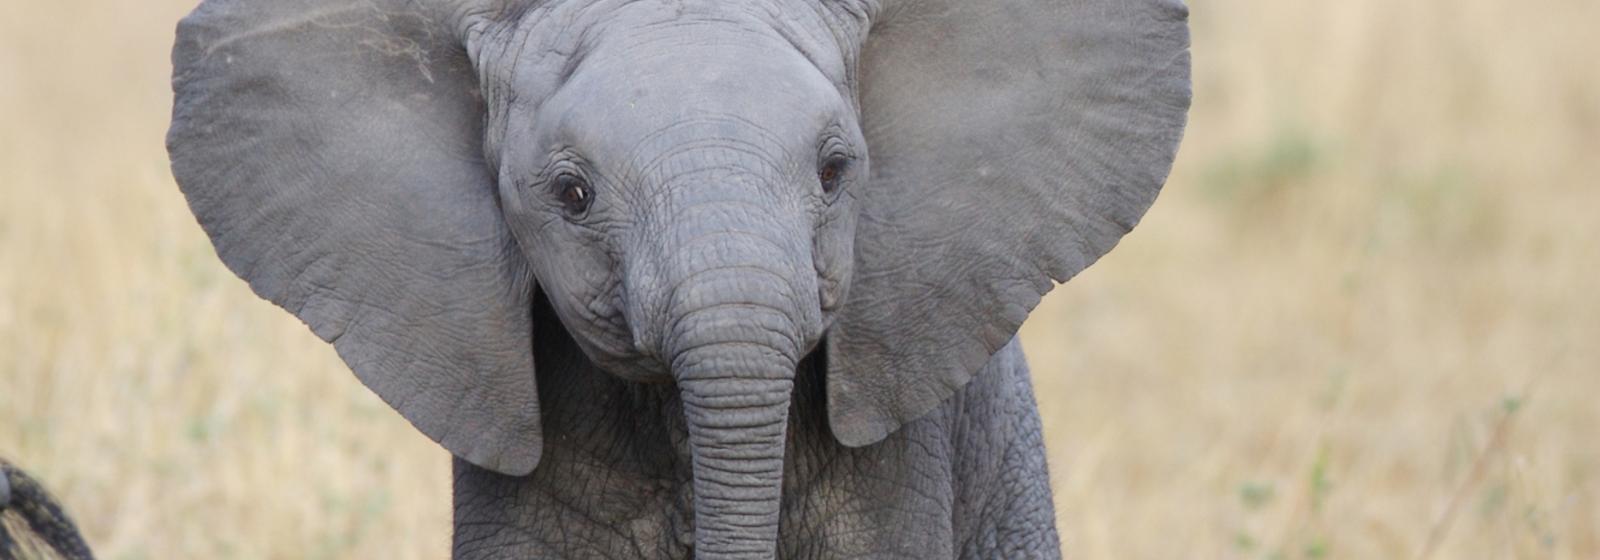 Help combat illegal wildlife trade